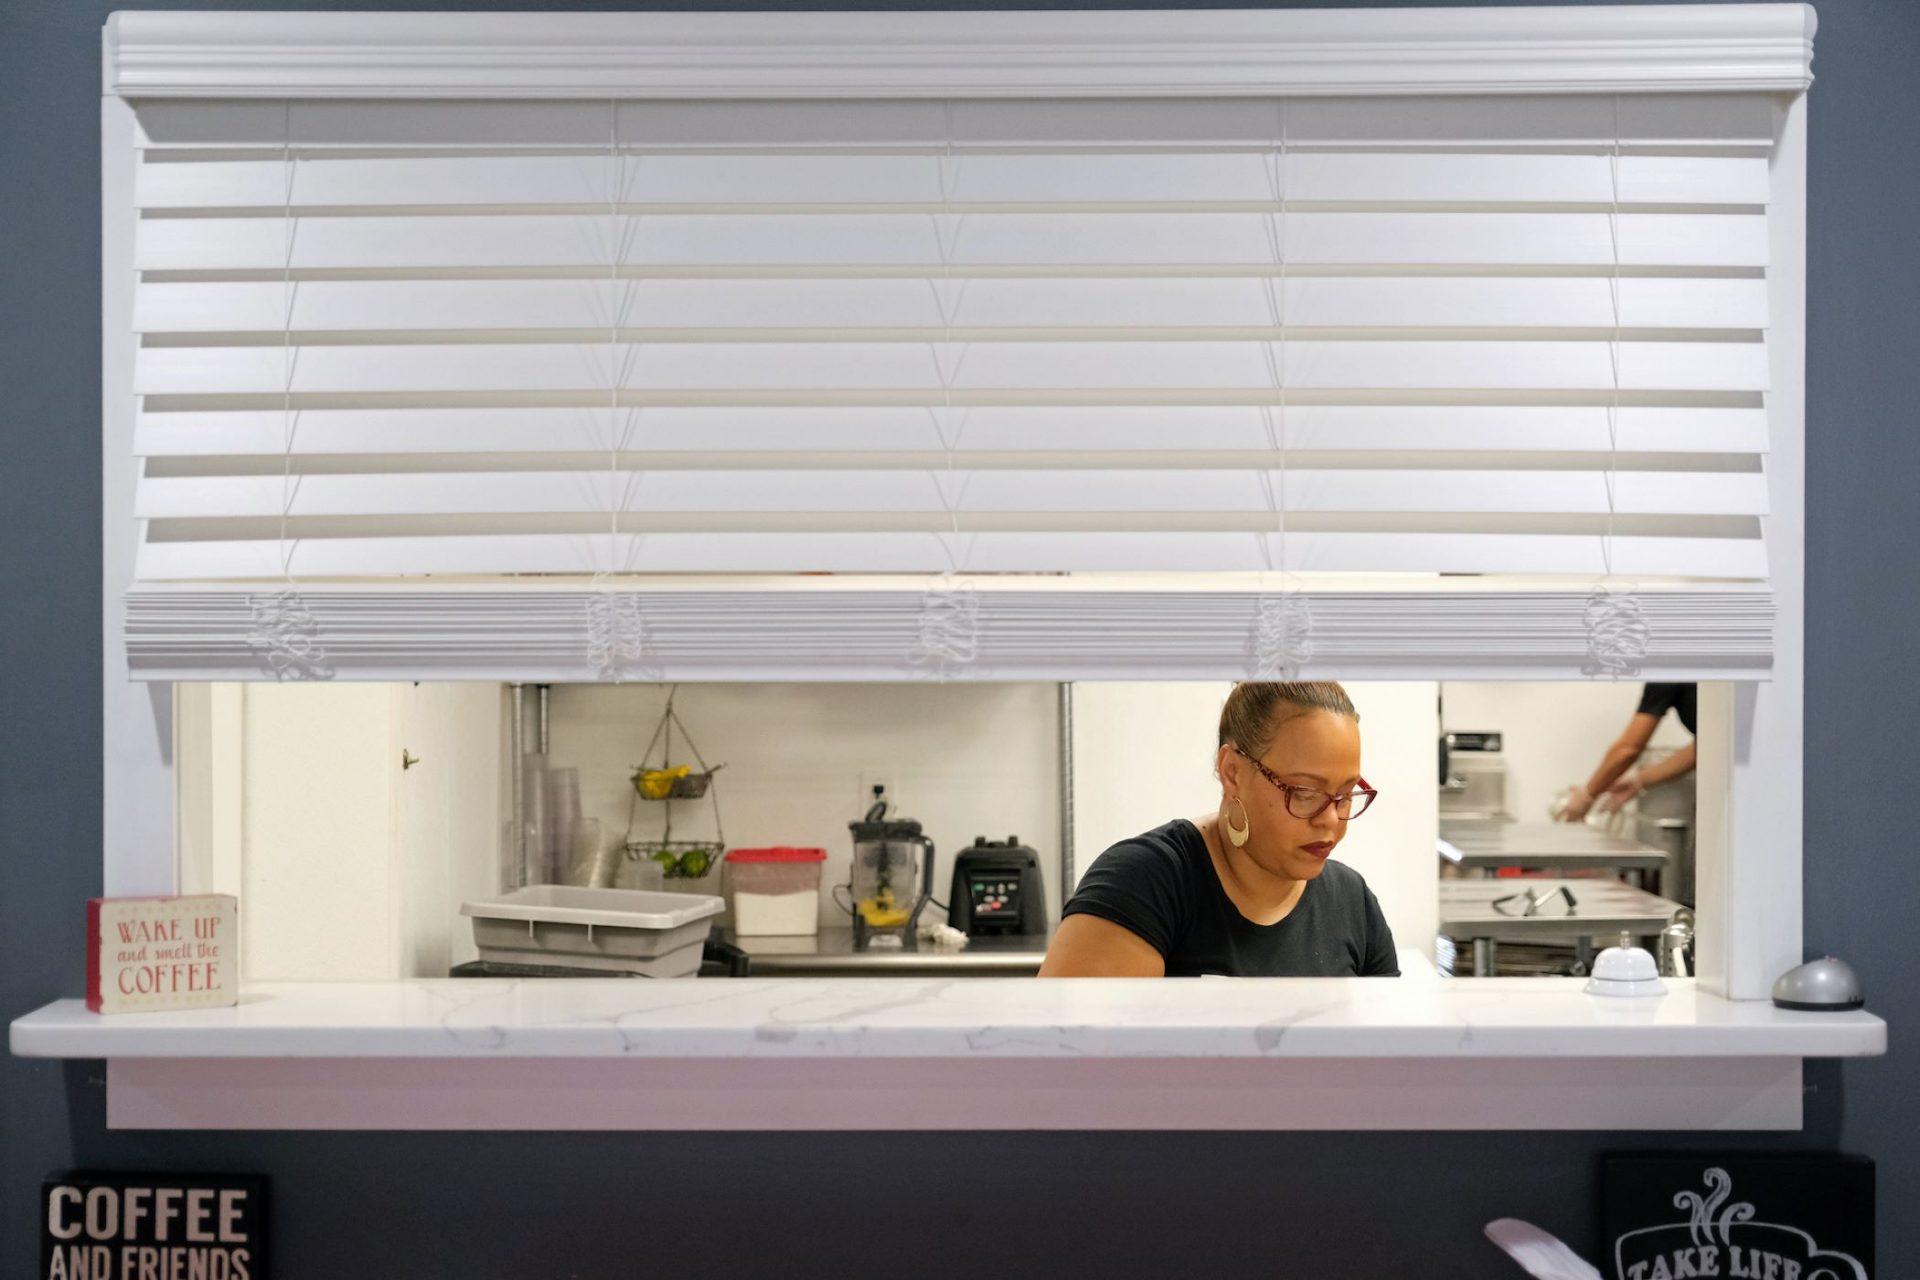 Johanny Cepeda-Freytiz works in the kitchen on April 3, 2020, at Mi Casa Su Casa cafe in Reading.